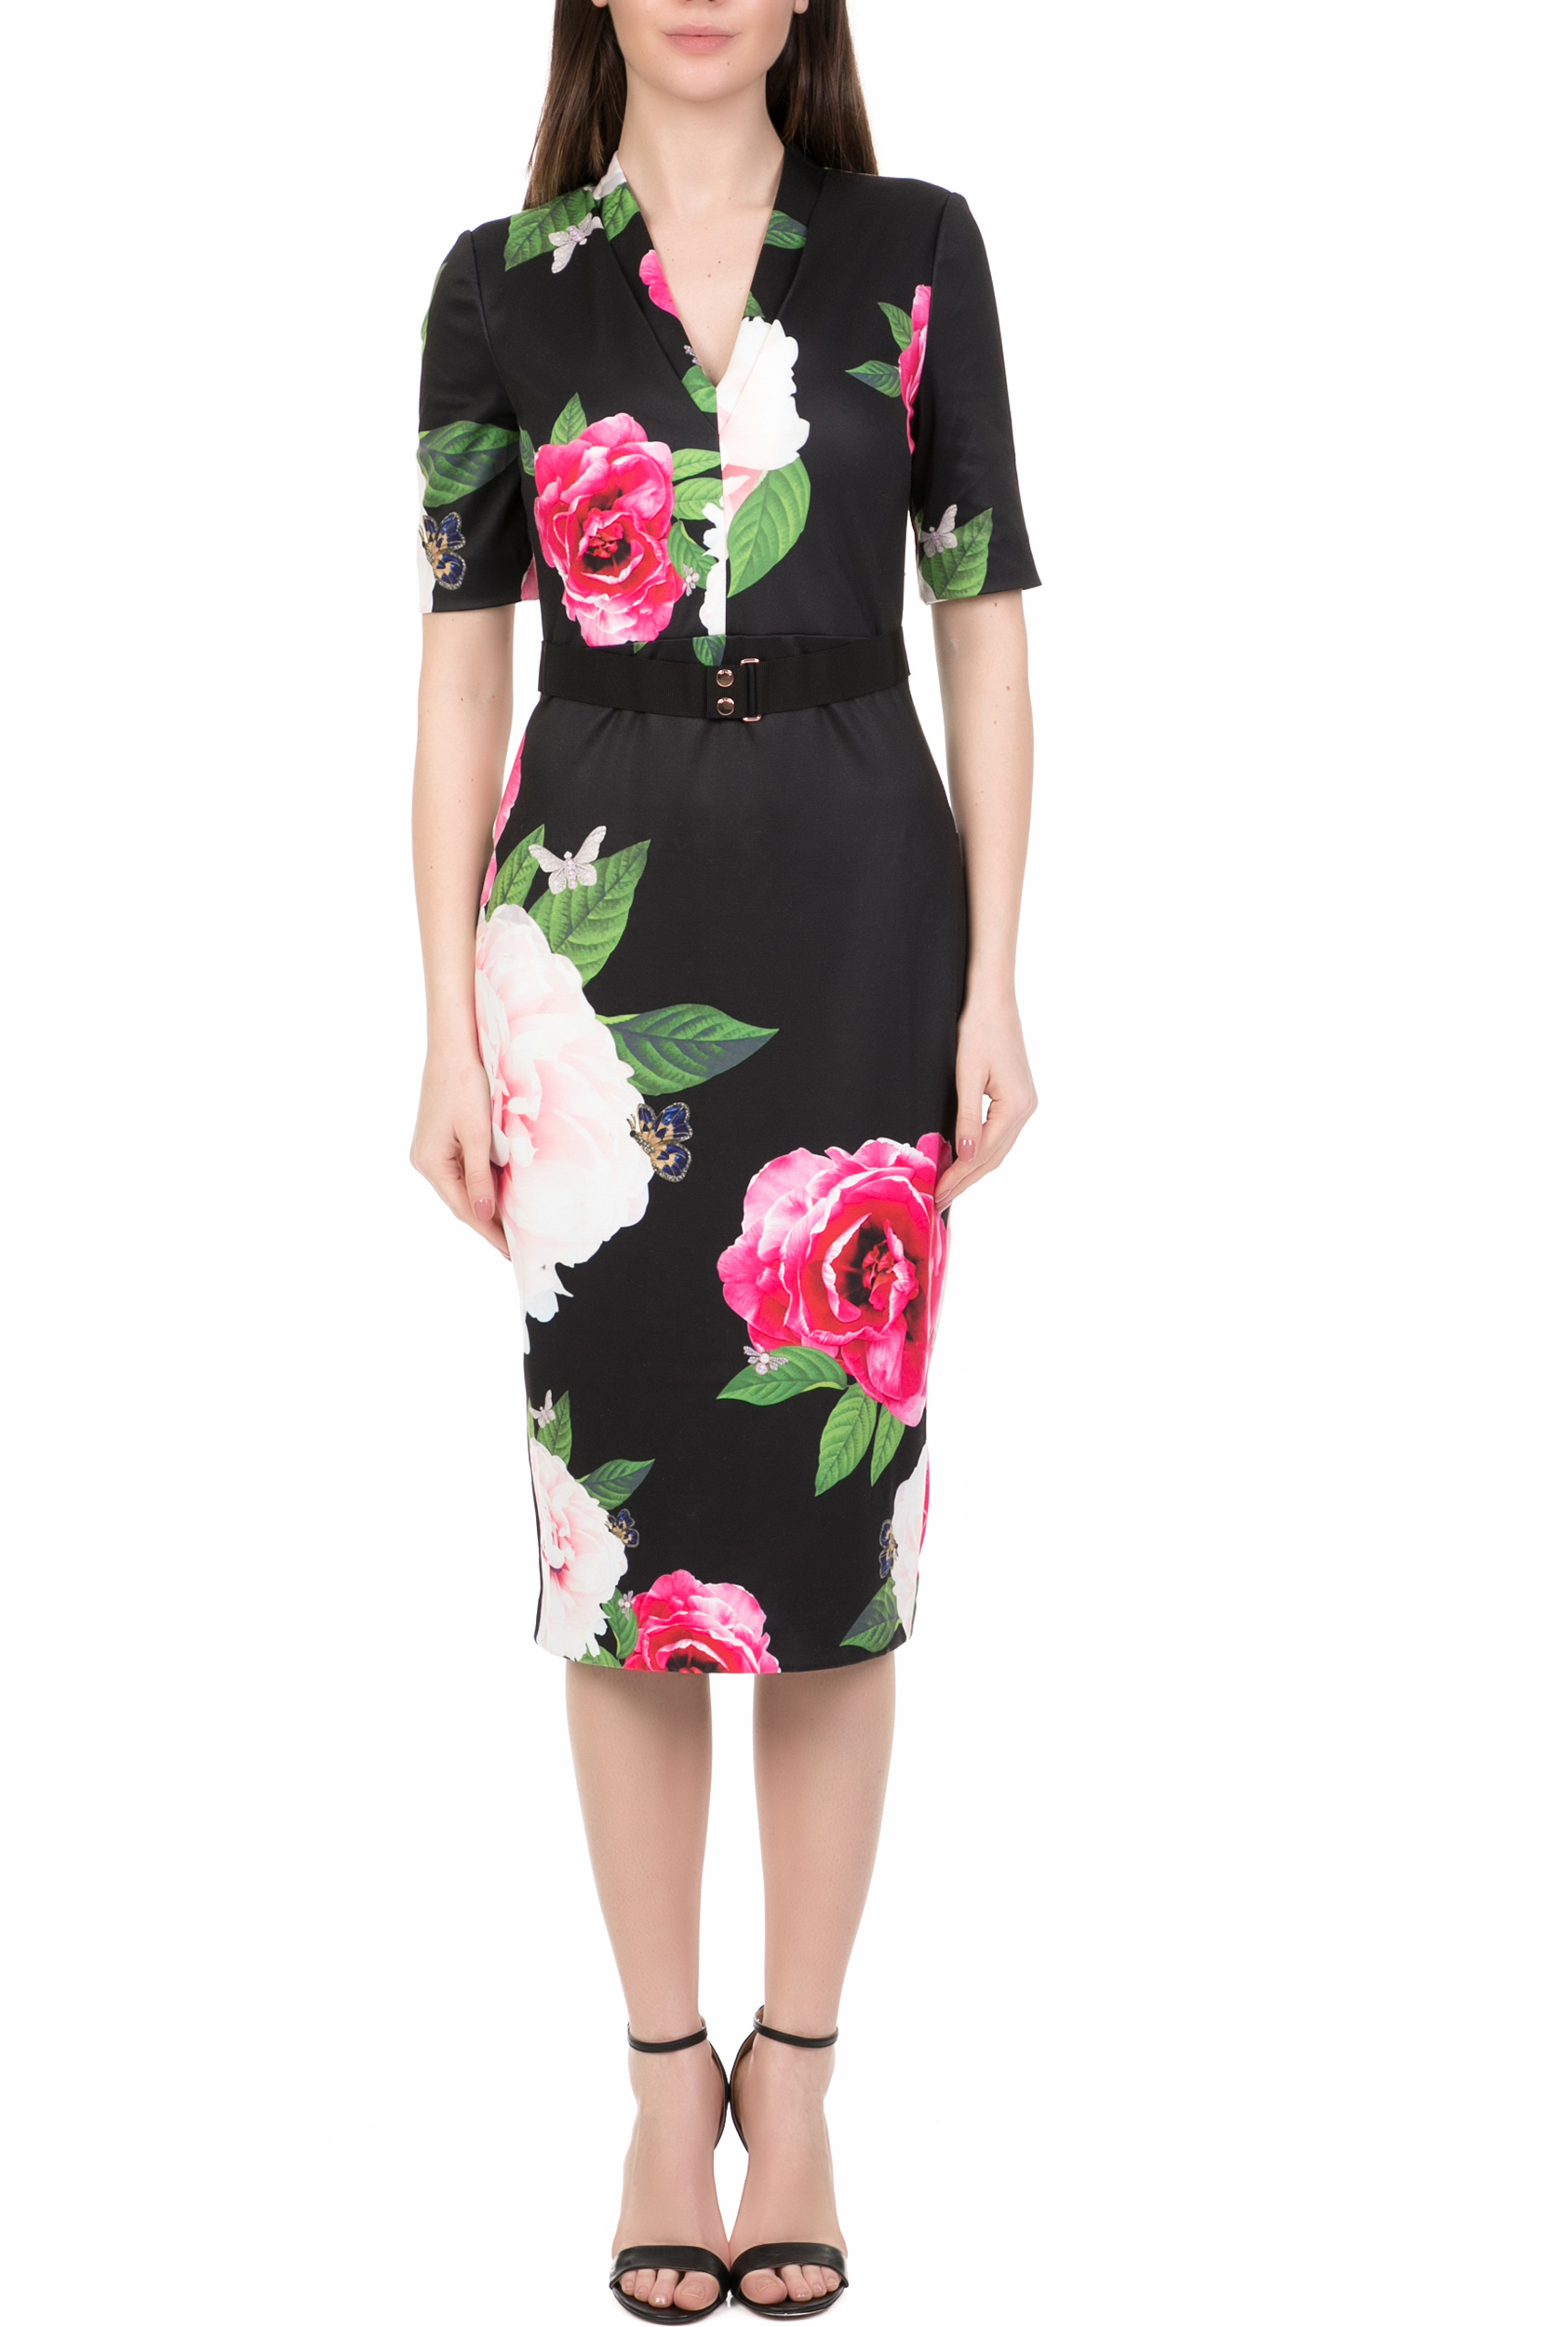 98170acc6f4e TED BAKER - Γυναικείο midi pencil φόρεμα TED BAKER GILANNO μαύρο